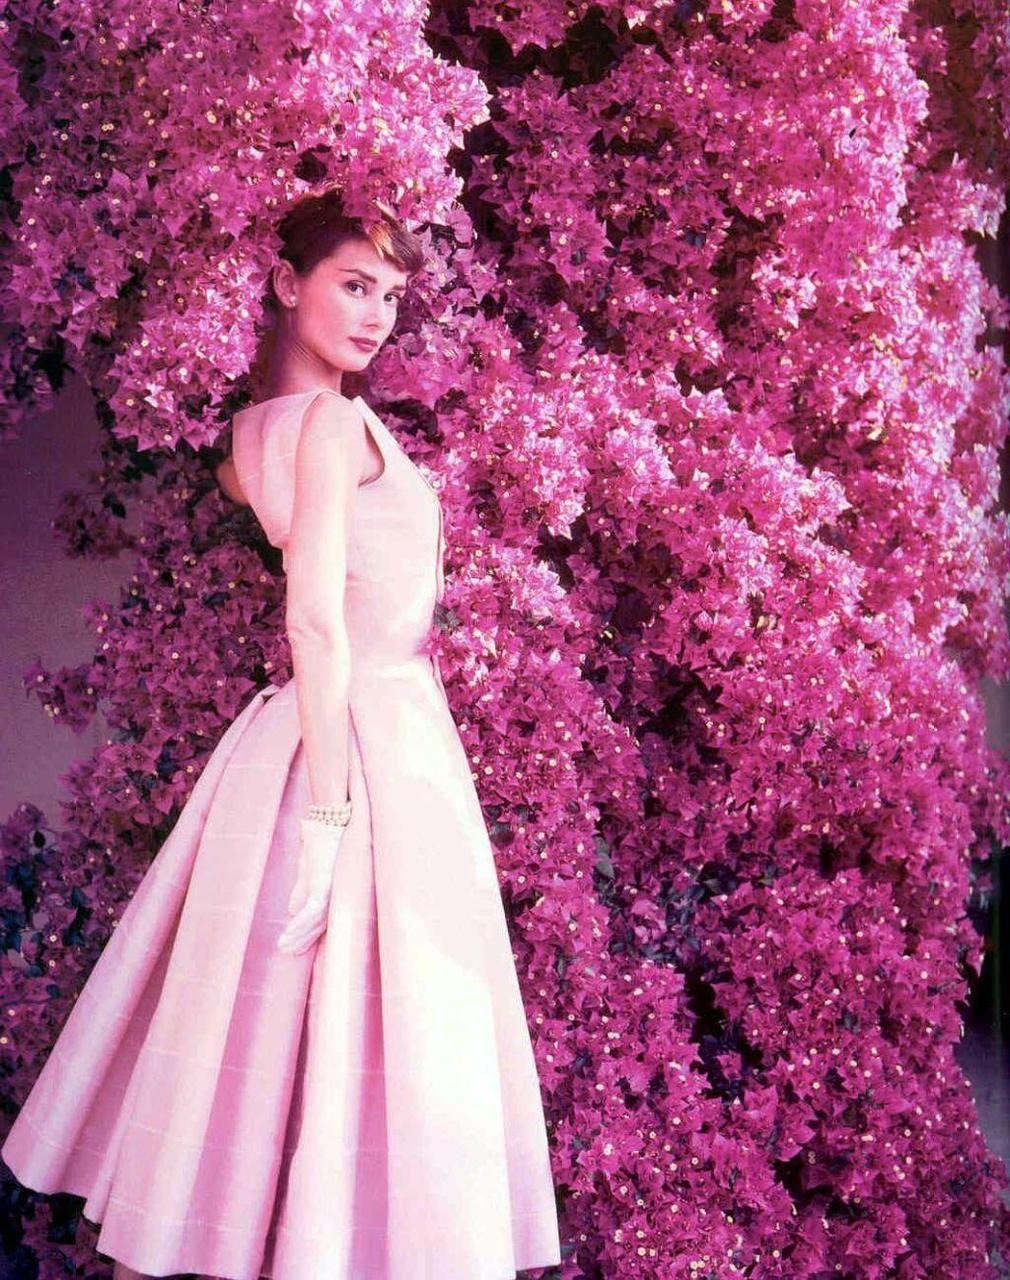 pink color tumblr - Google keresés | Pink | Pinterest | Acción y Cámaras